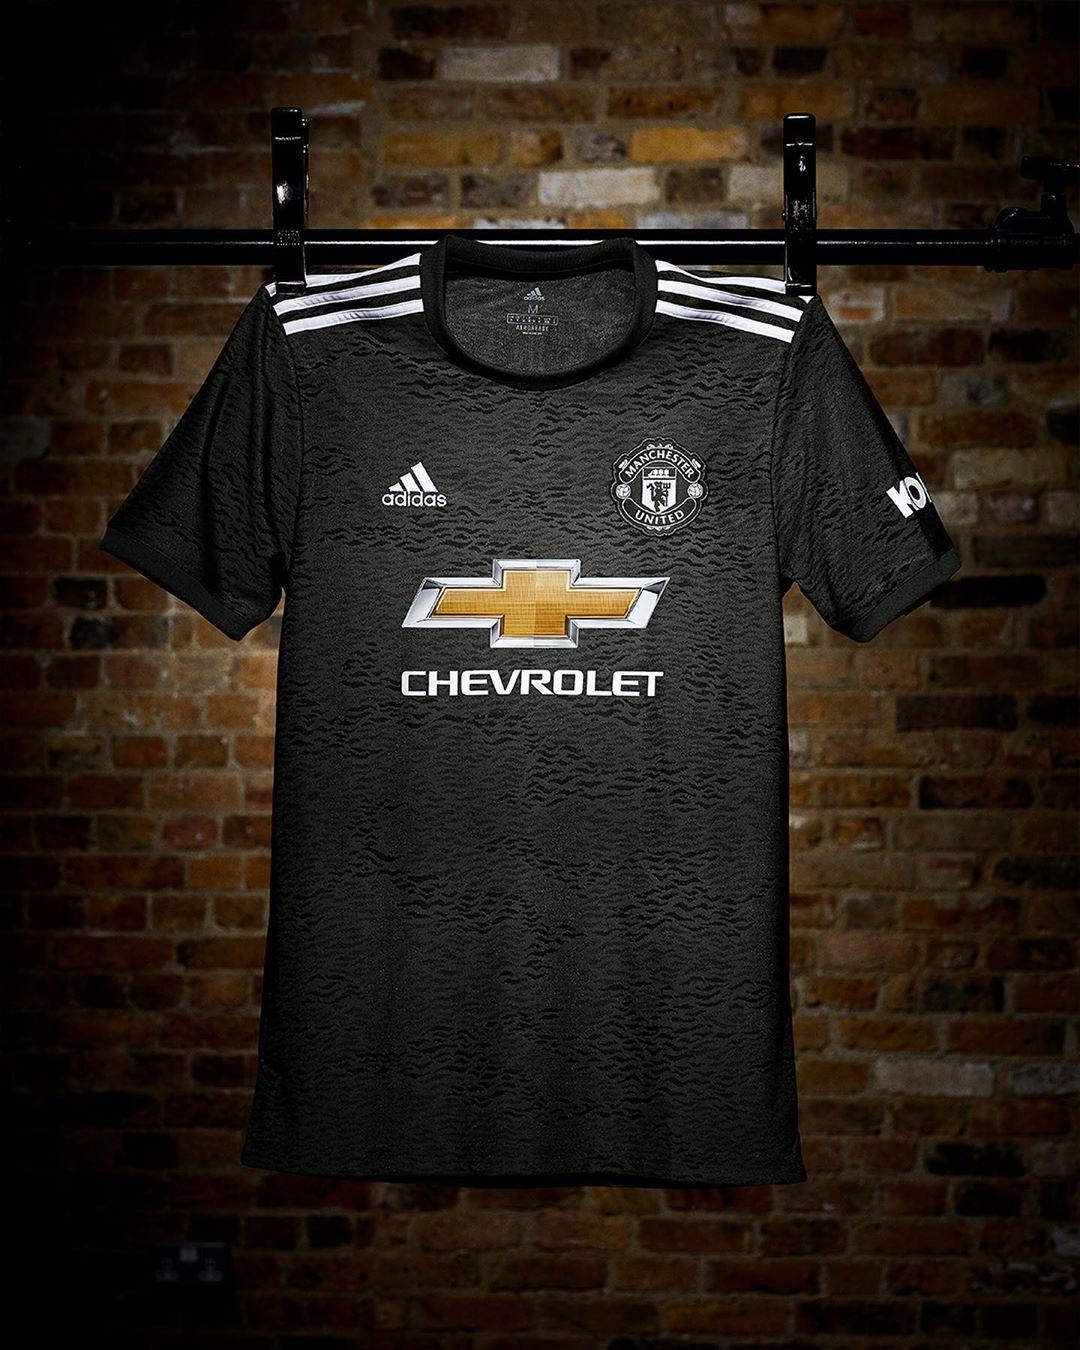 Camisa reserva do Manchester United 2020-2021 Adidas